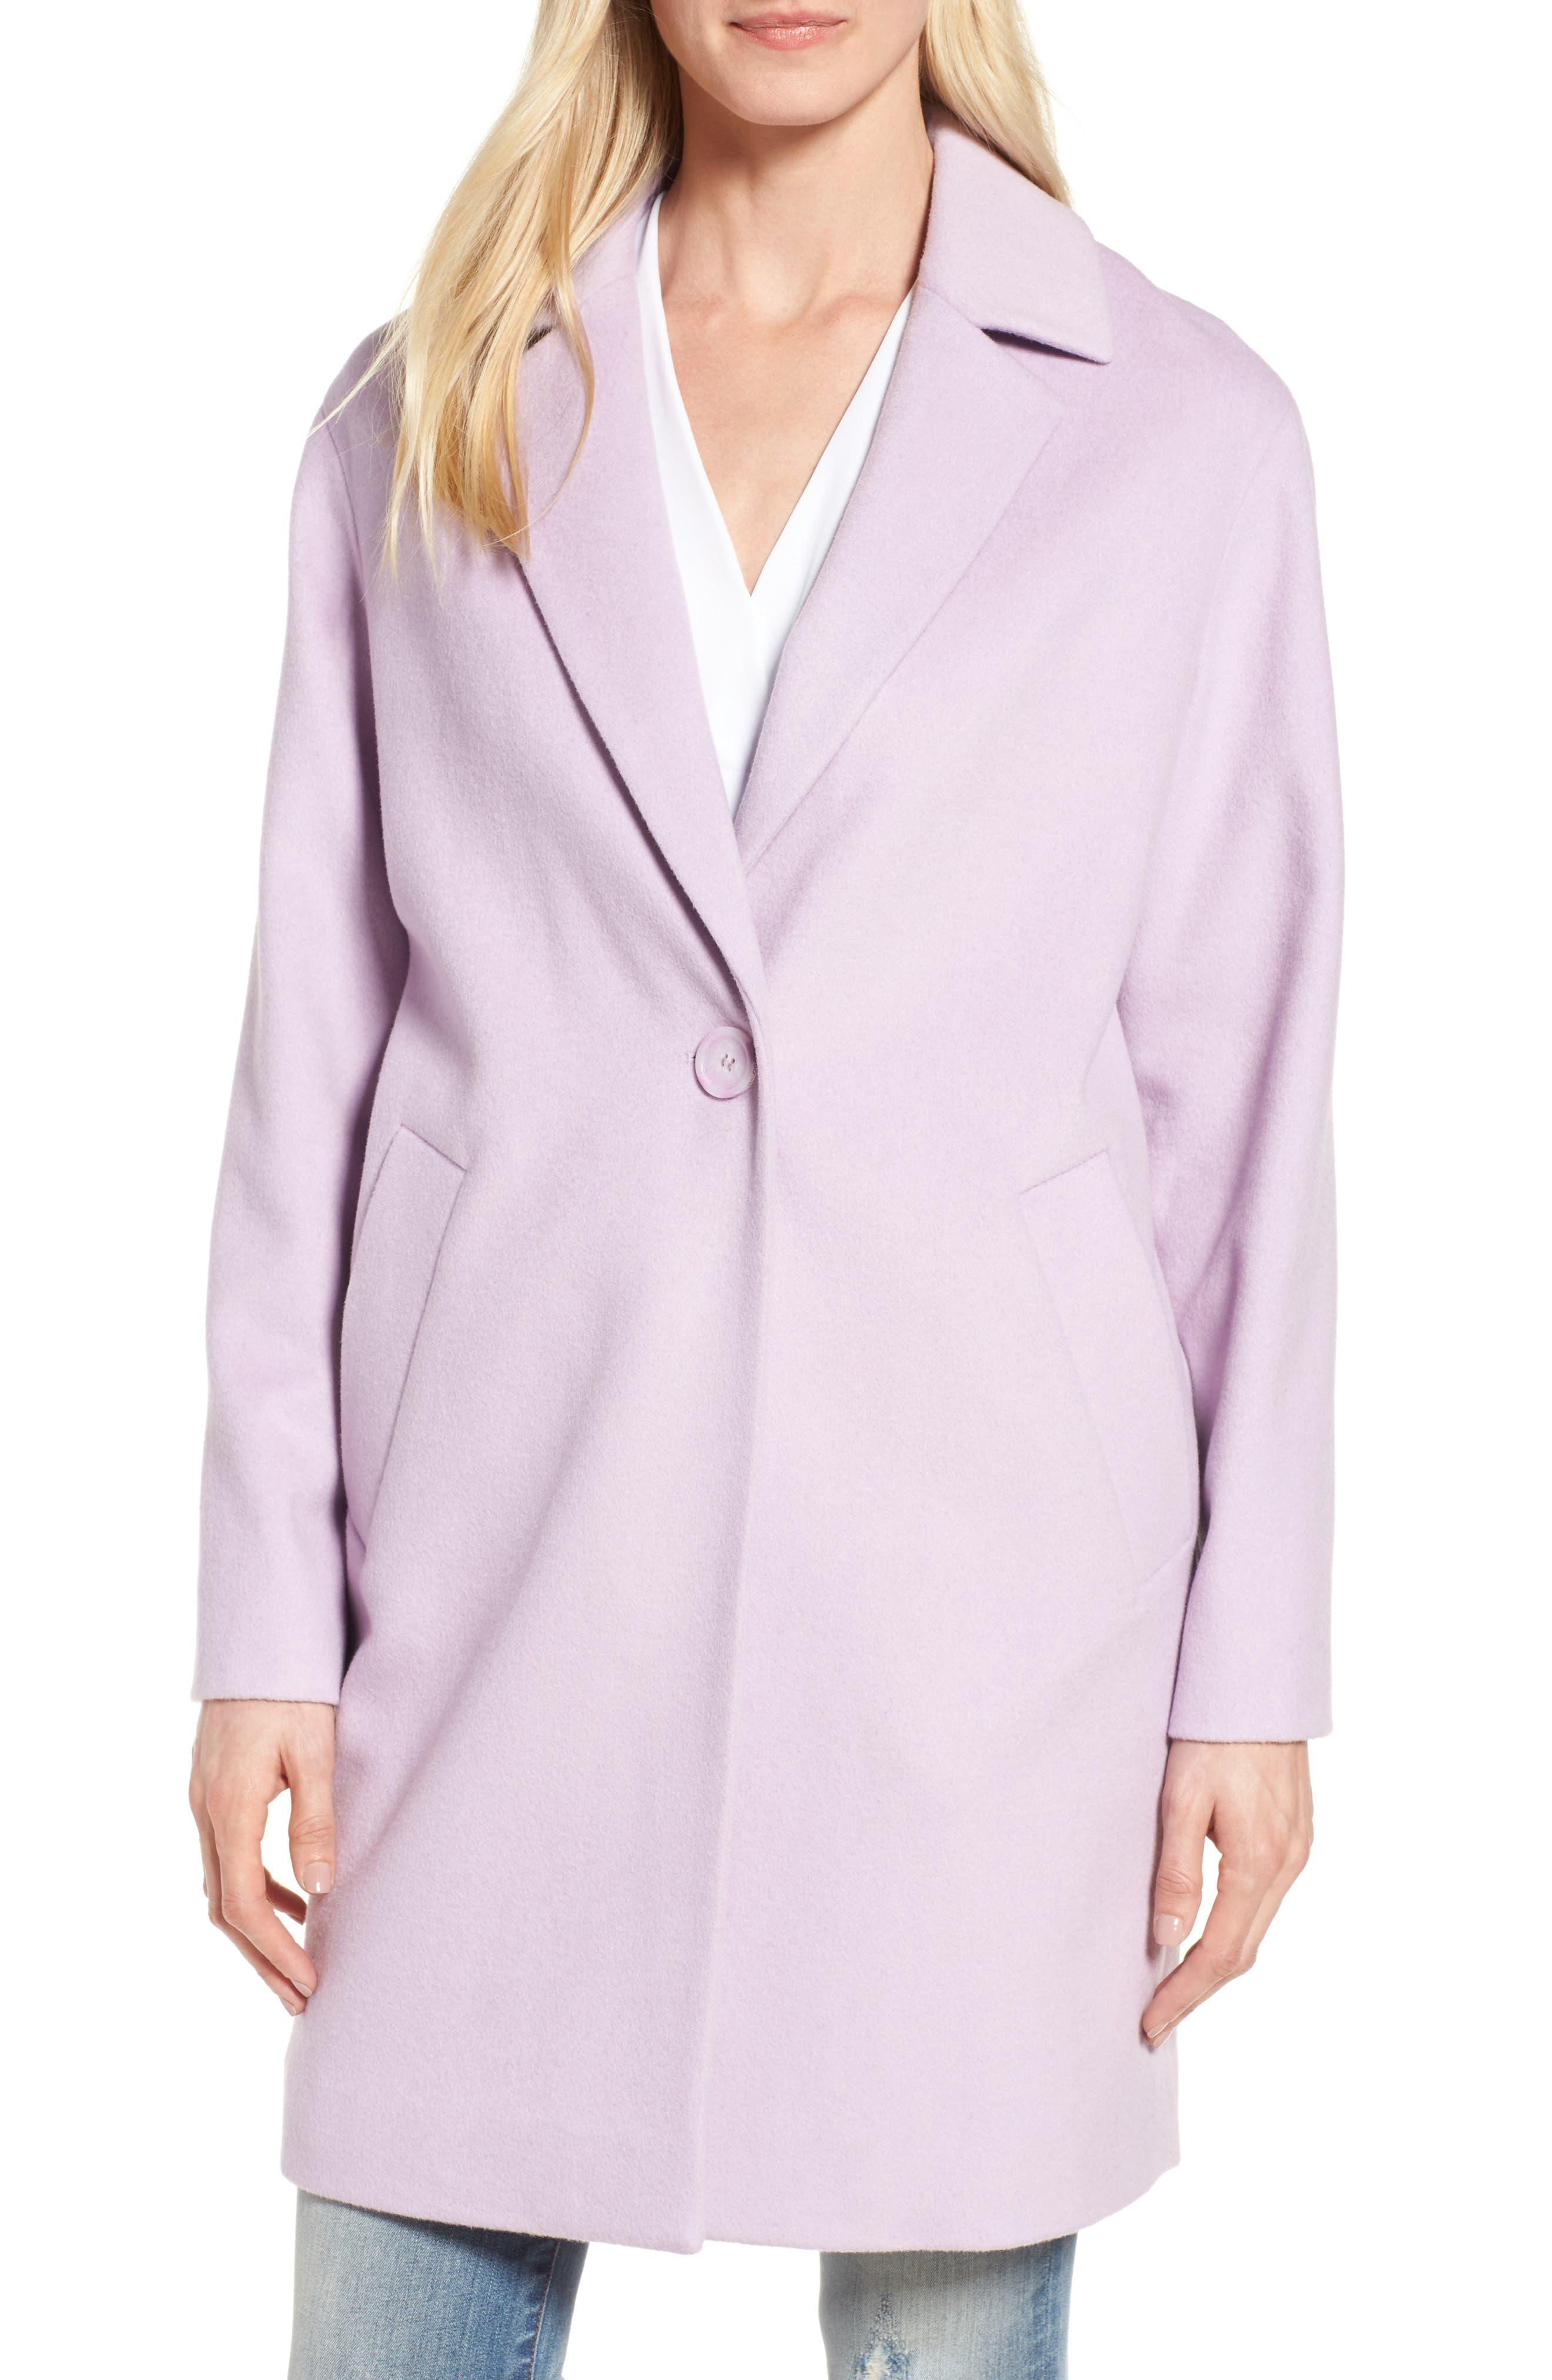 Wool Blend Coat,                             Main thumbnail 1, color,                             Icy Lavendar